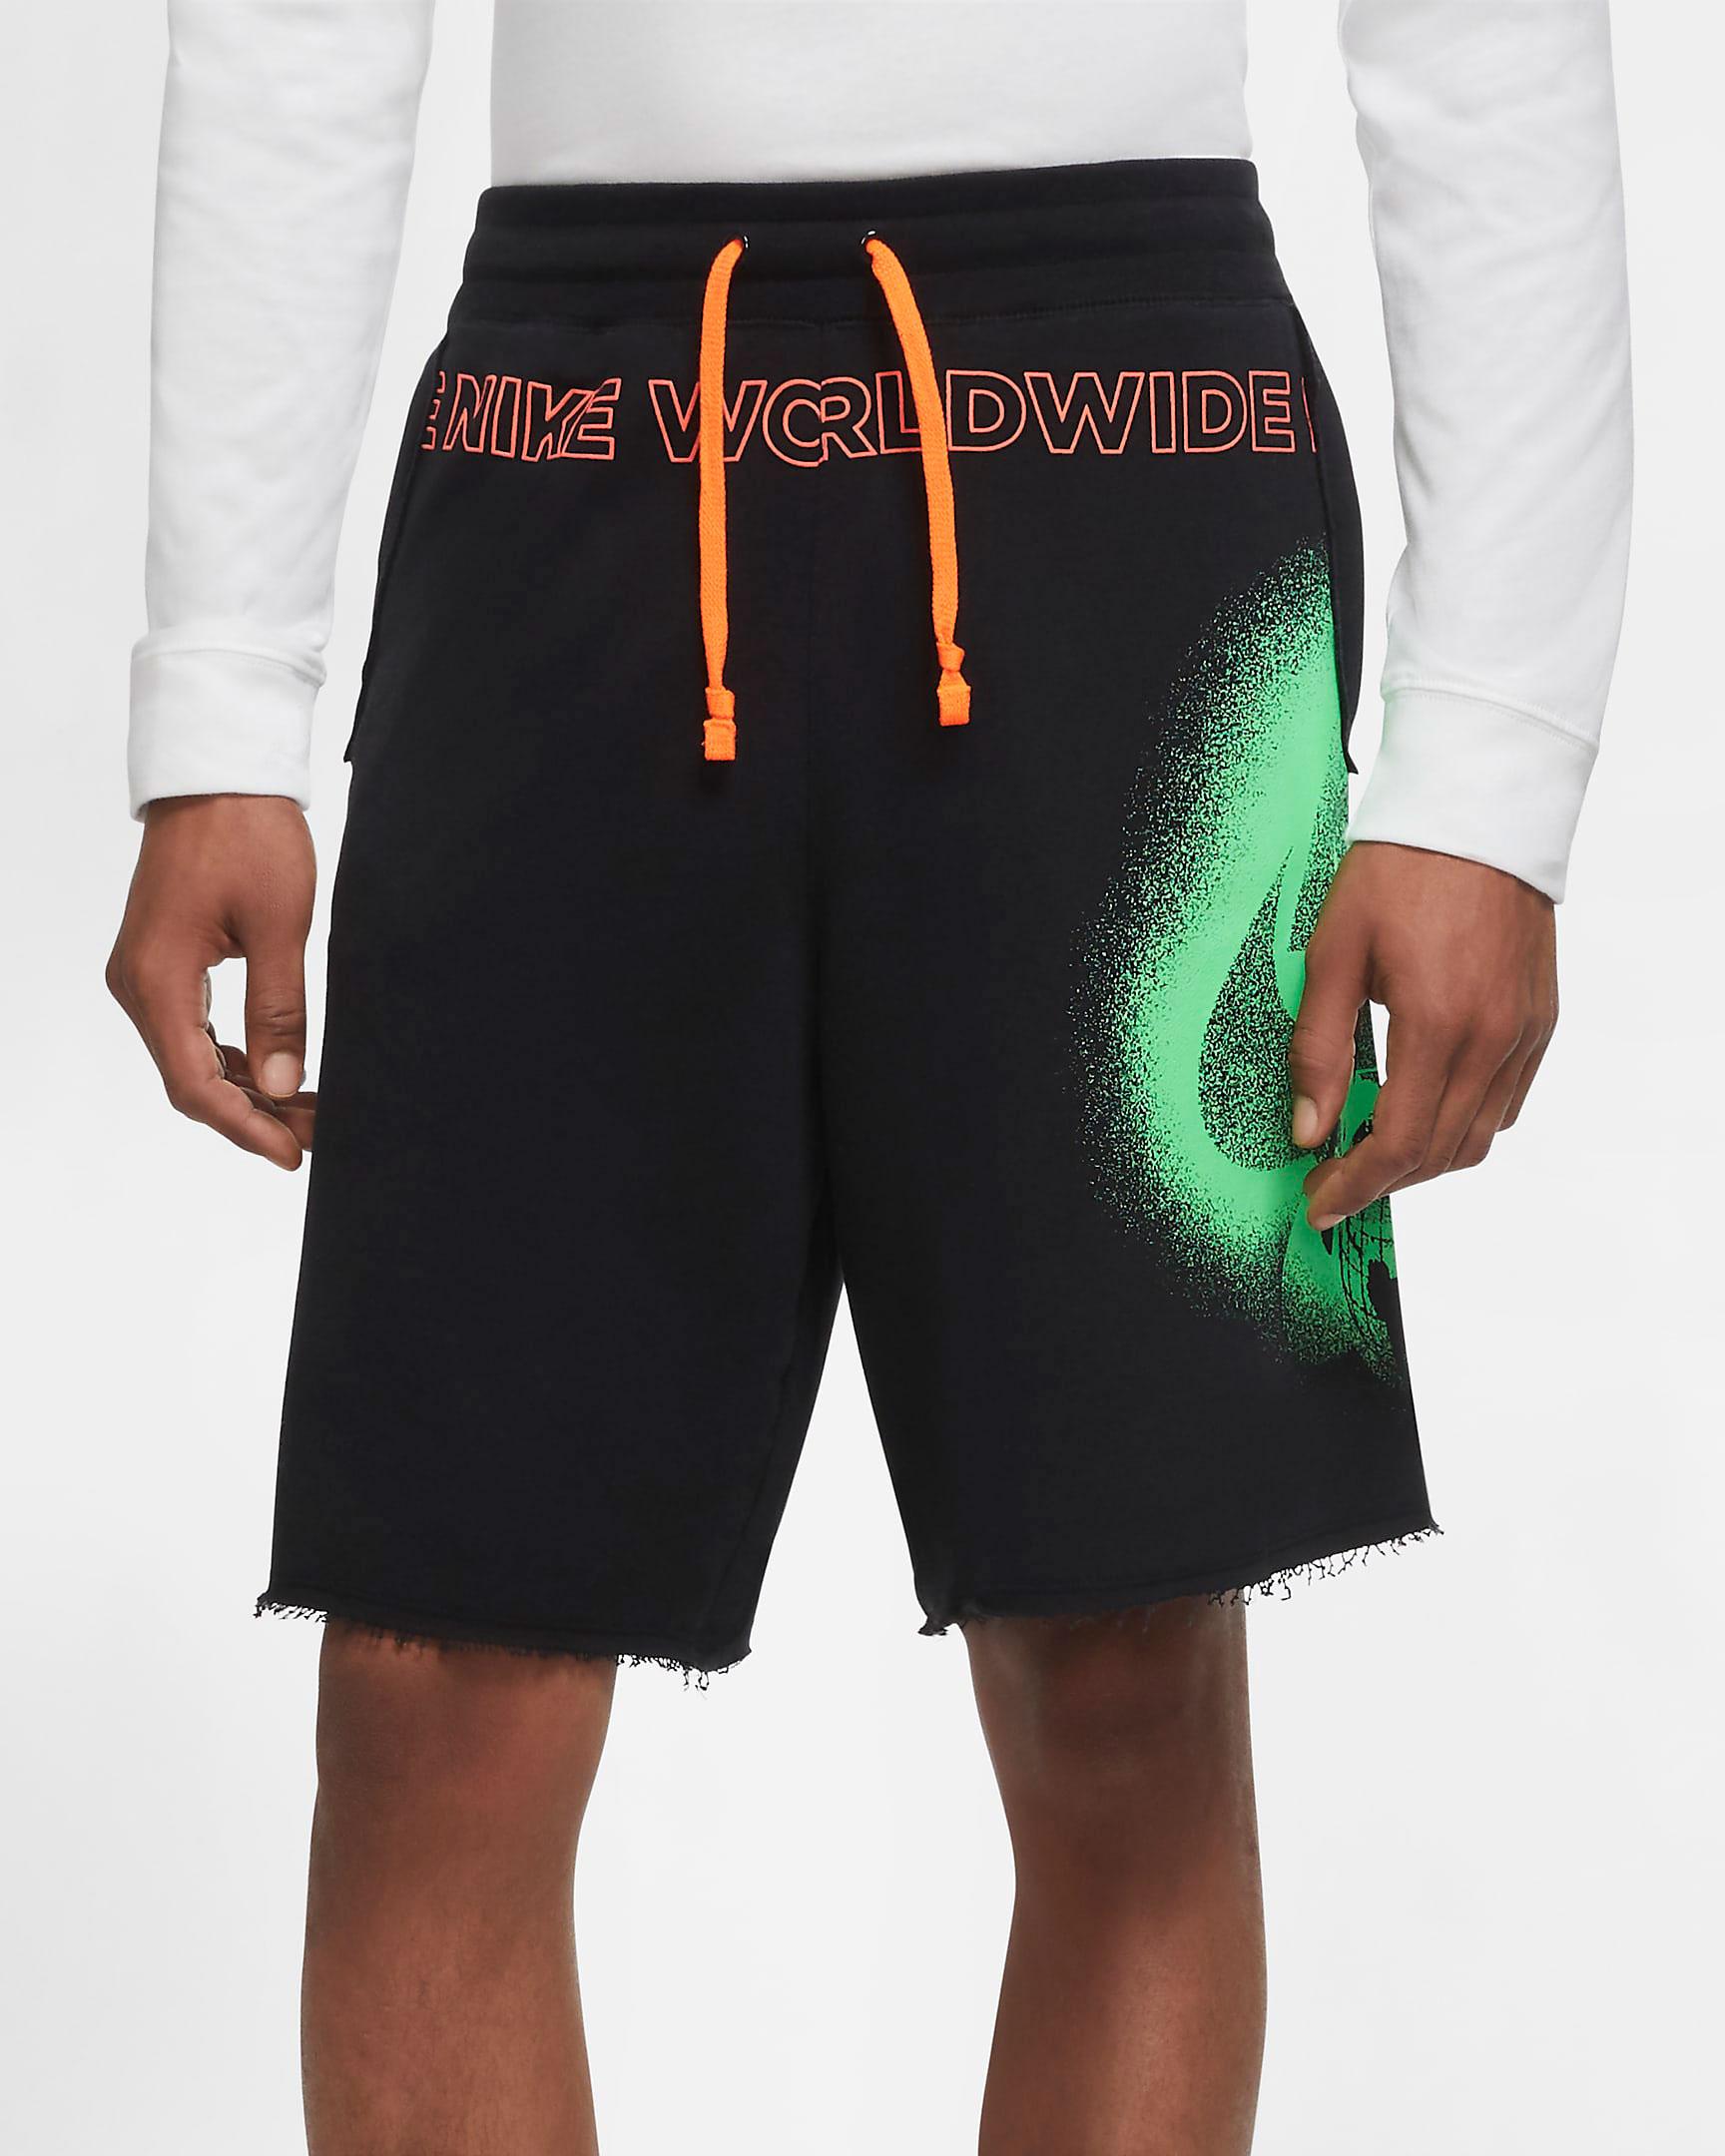 nike-sportswear-worldwide-alumni-shorts-black-green-1